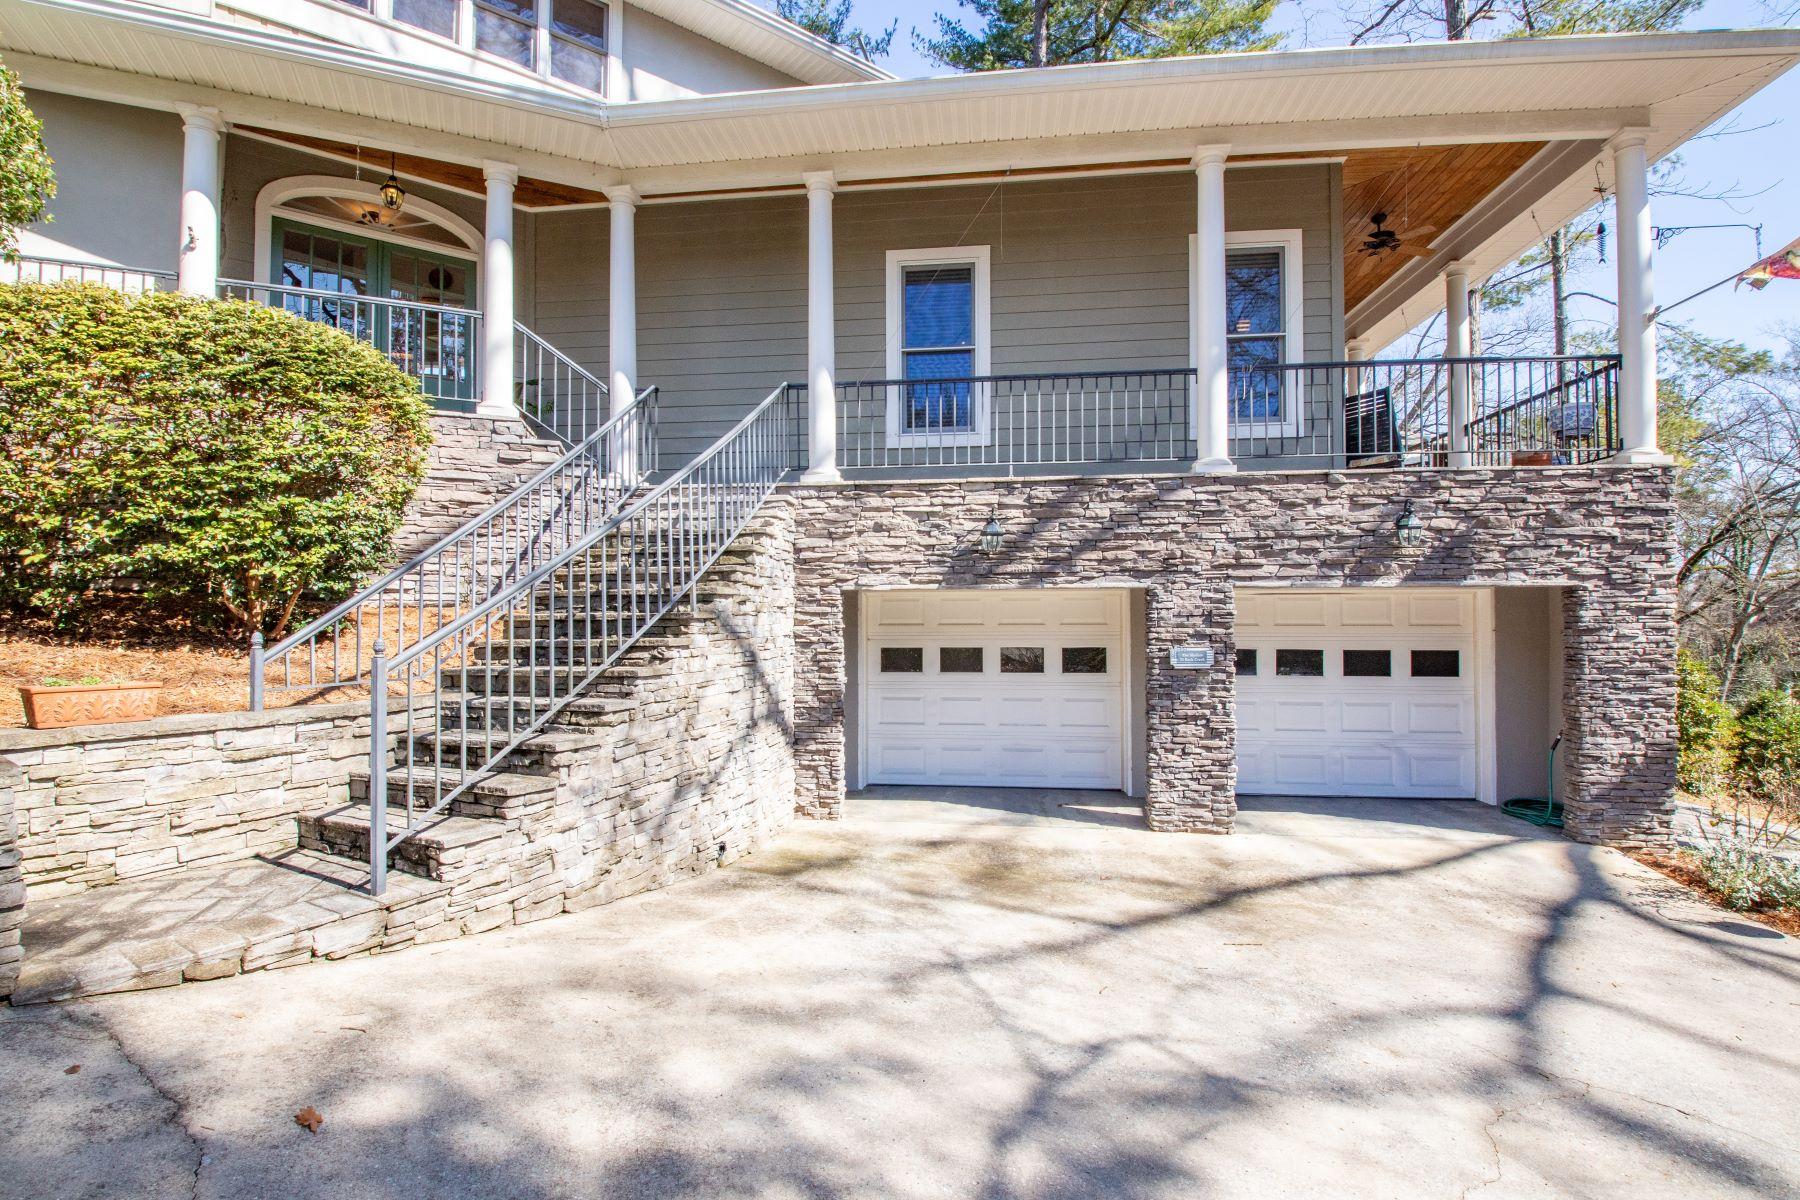 Single Family Homes for Sale at 33 Rock Creek Drive, Greenville, SC 29605 33 Rock Creek Drive Greenville, South Carolina 29605 United States